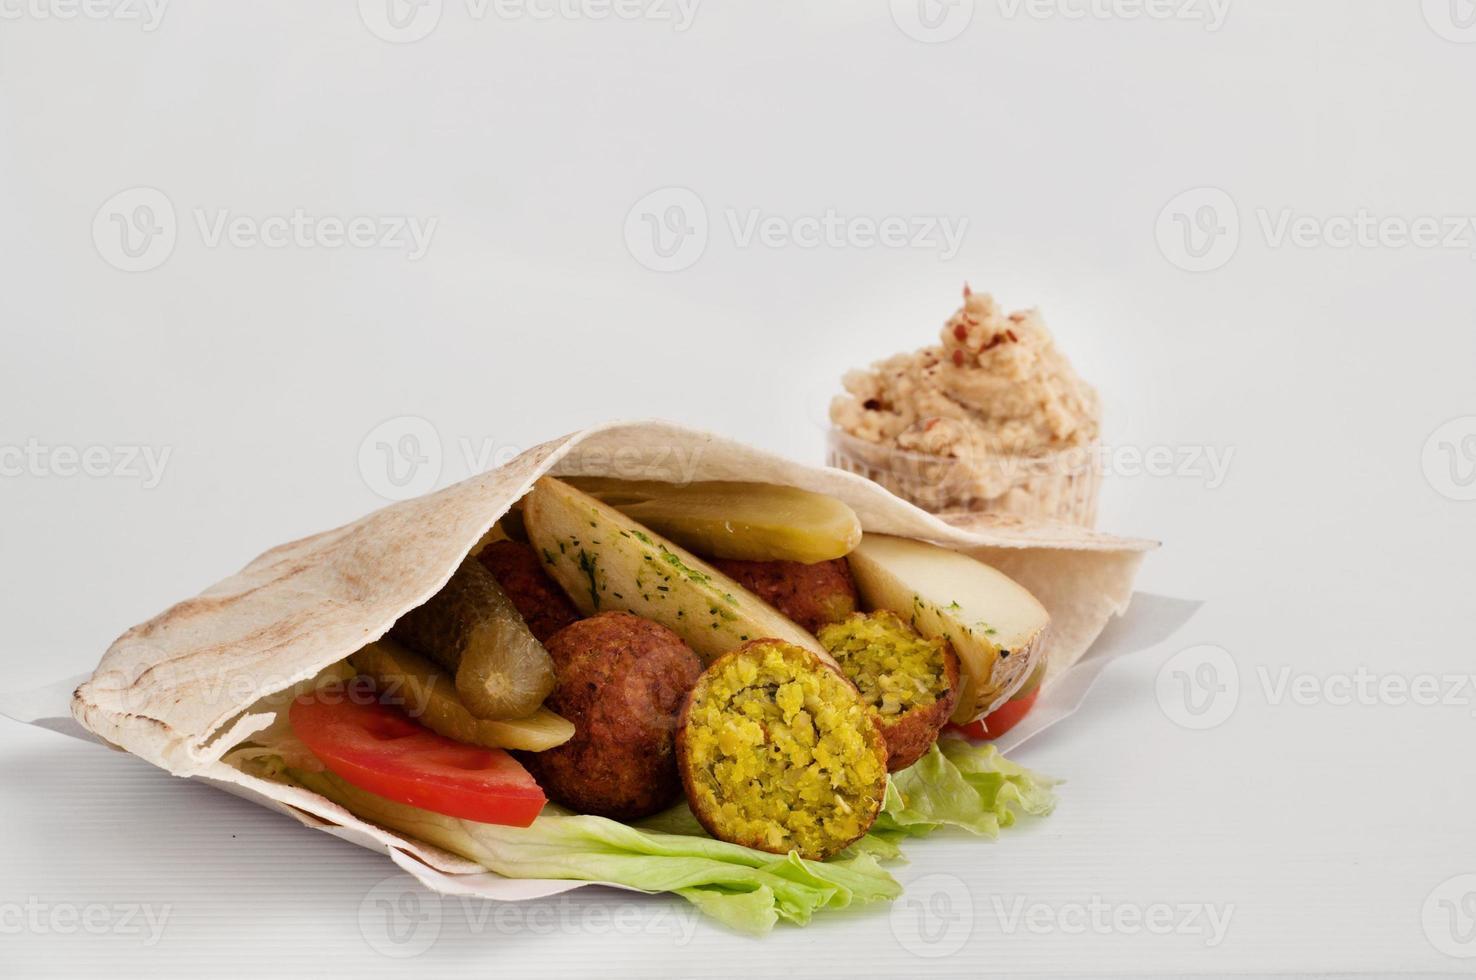 falafel met groenten in pitabroodje en saus foto